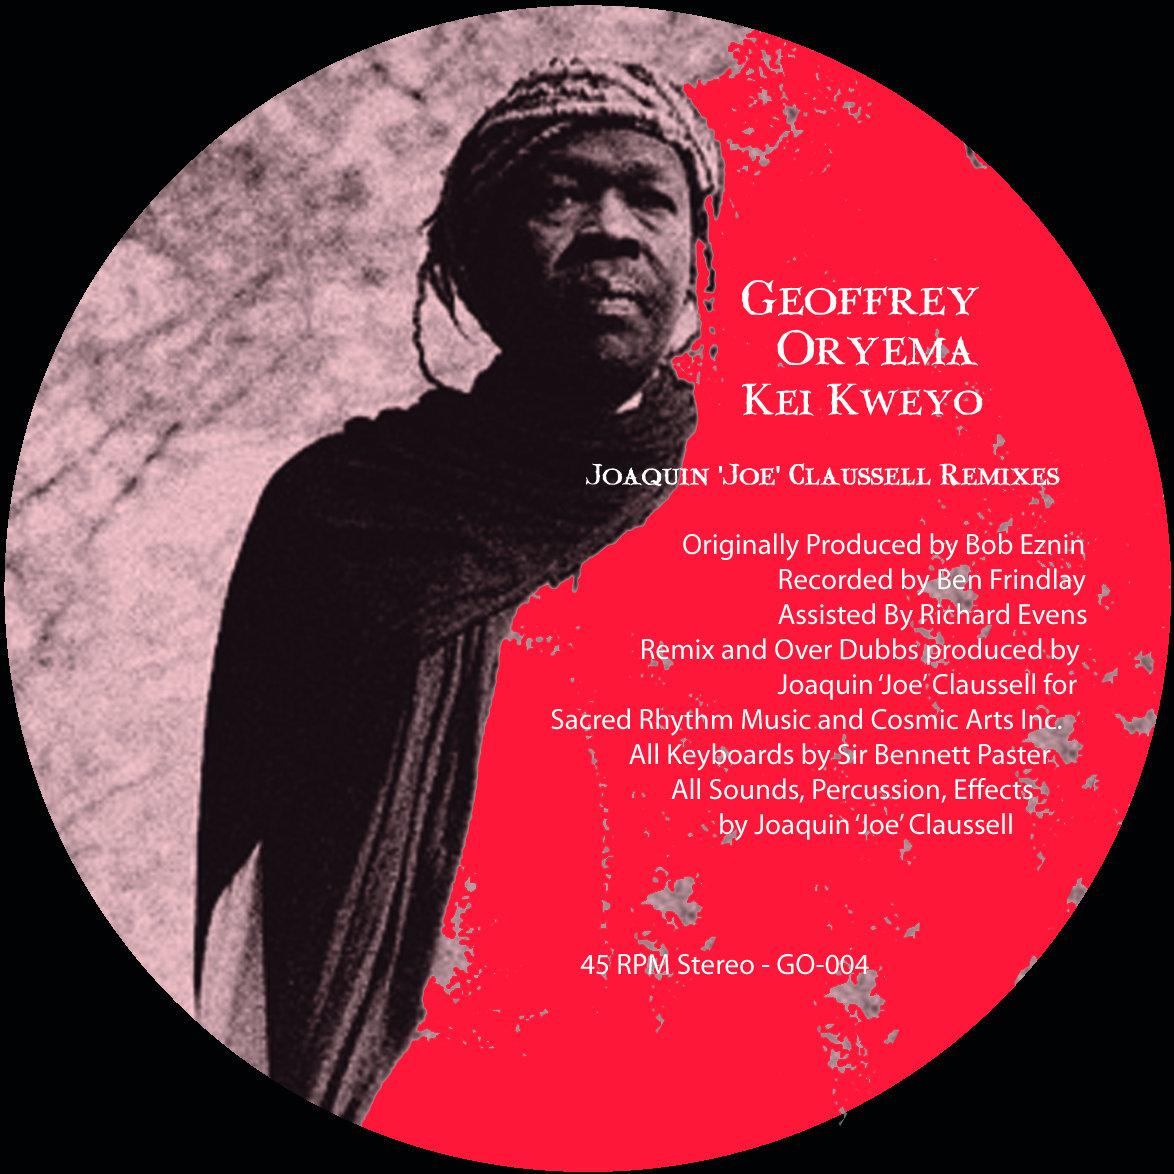 Geoffrey Oryema Kei Kweyo